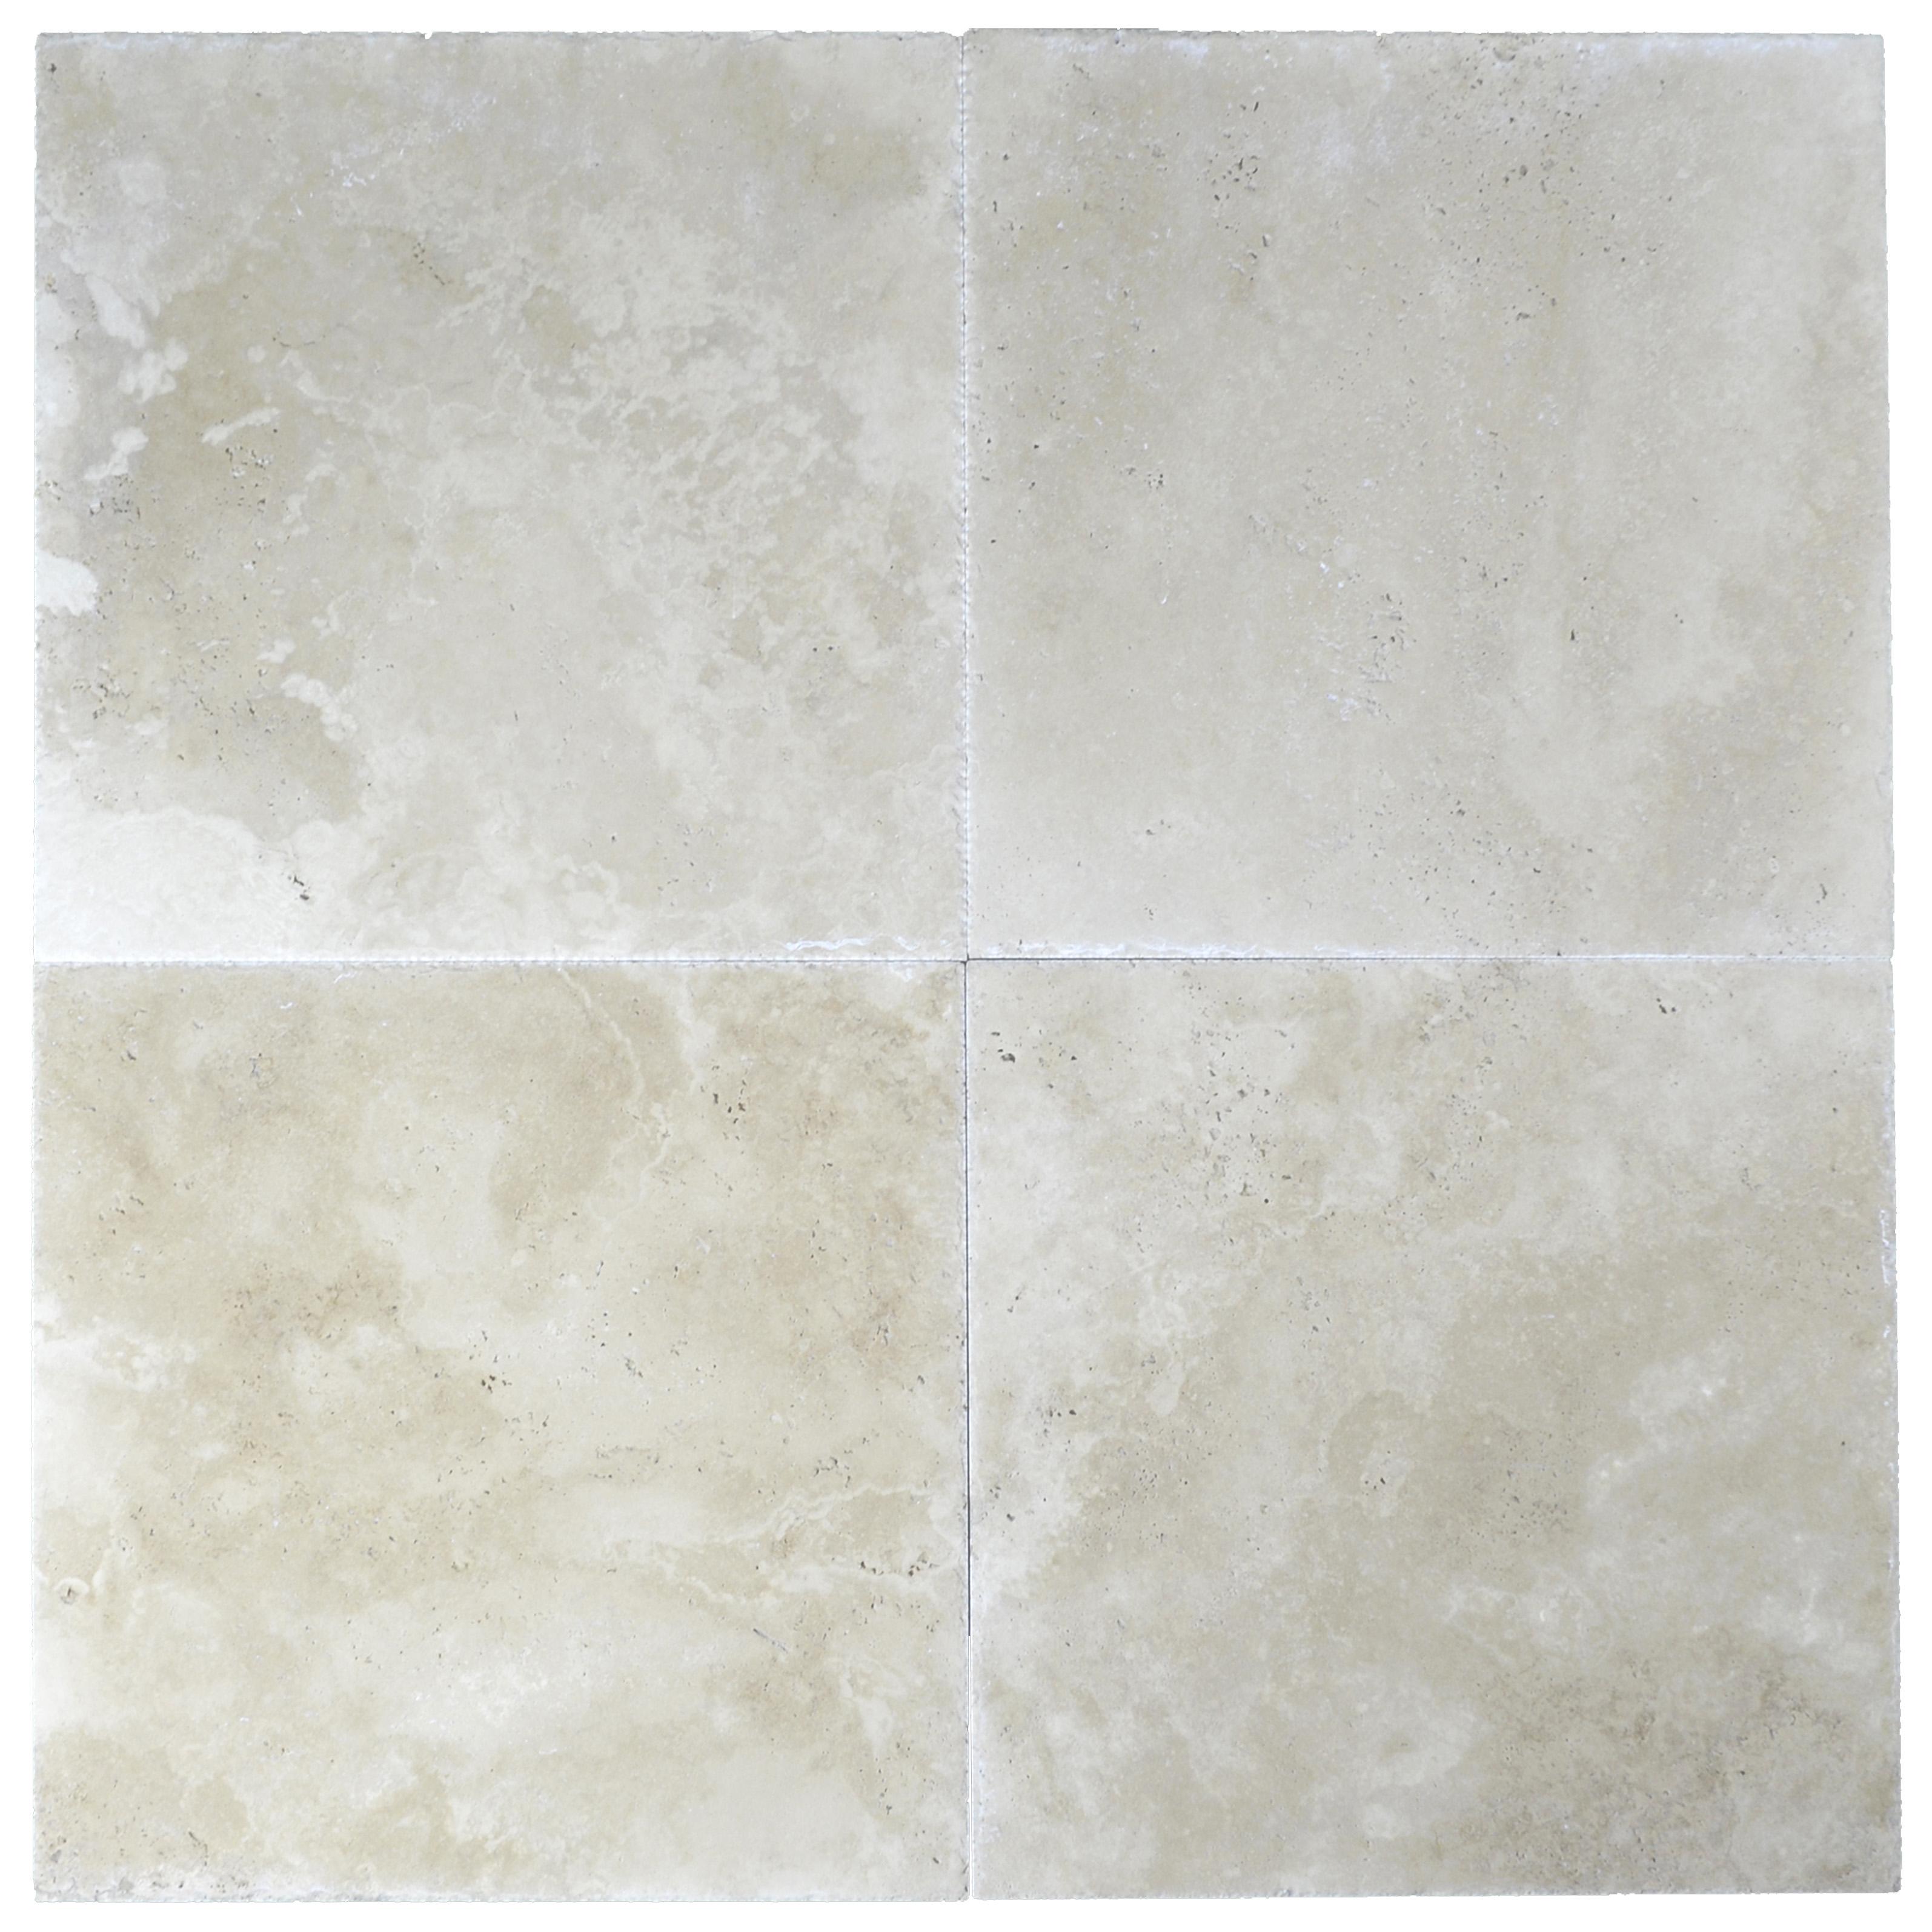 super light brushed and chiseled travertine tile 18x18 -Travertine sales-Atantic Stone Source